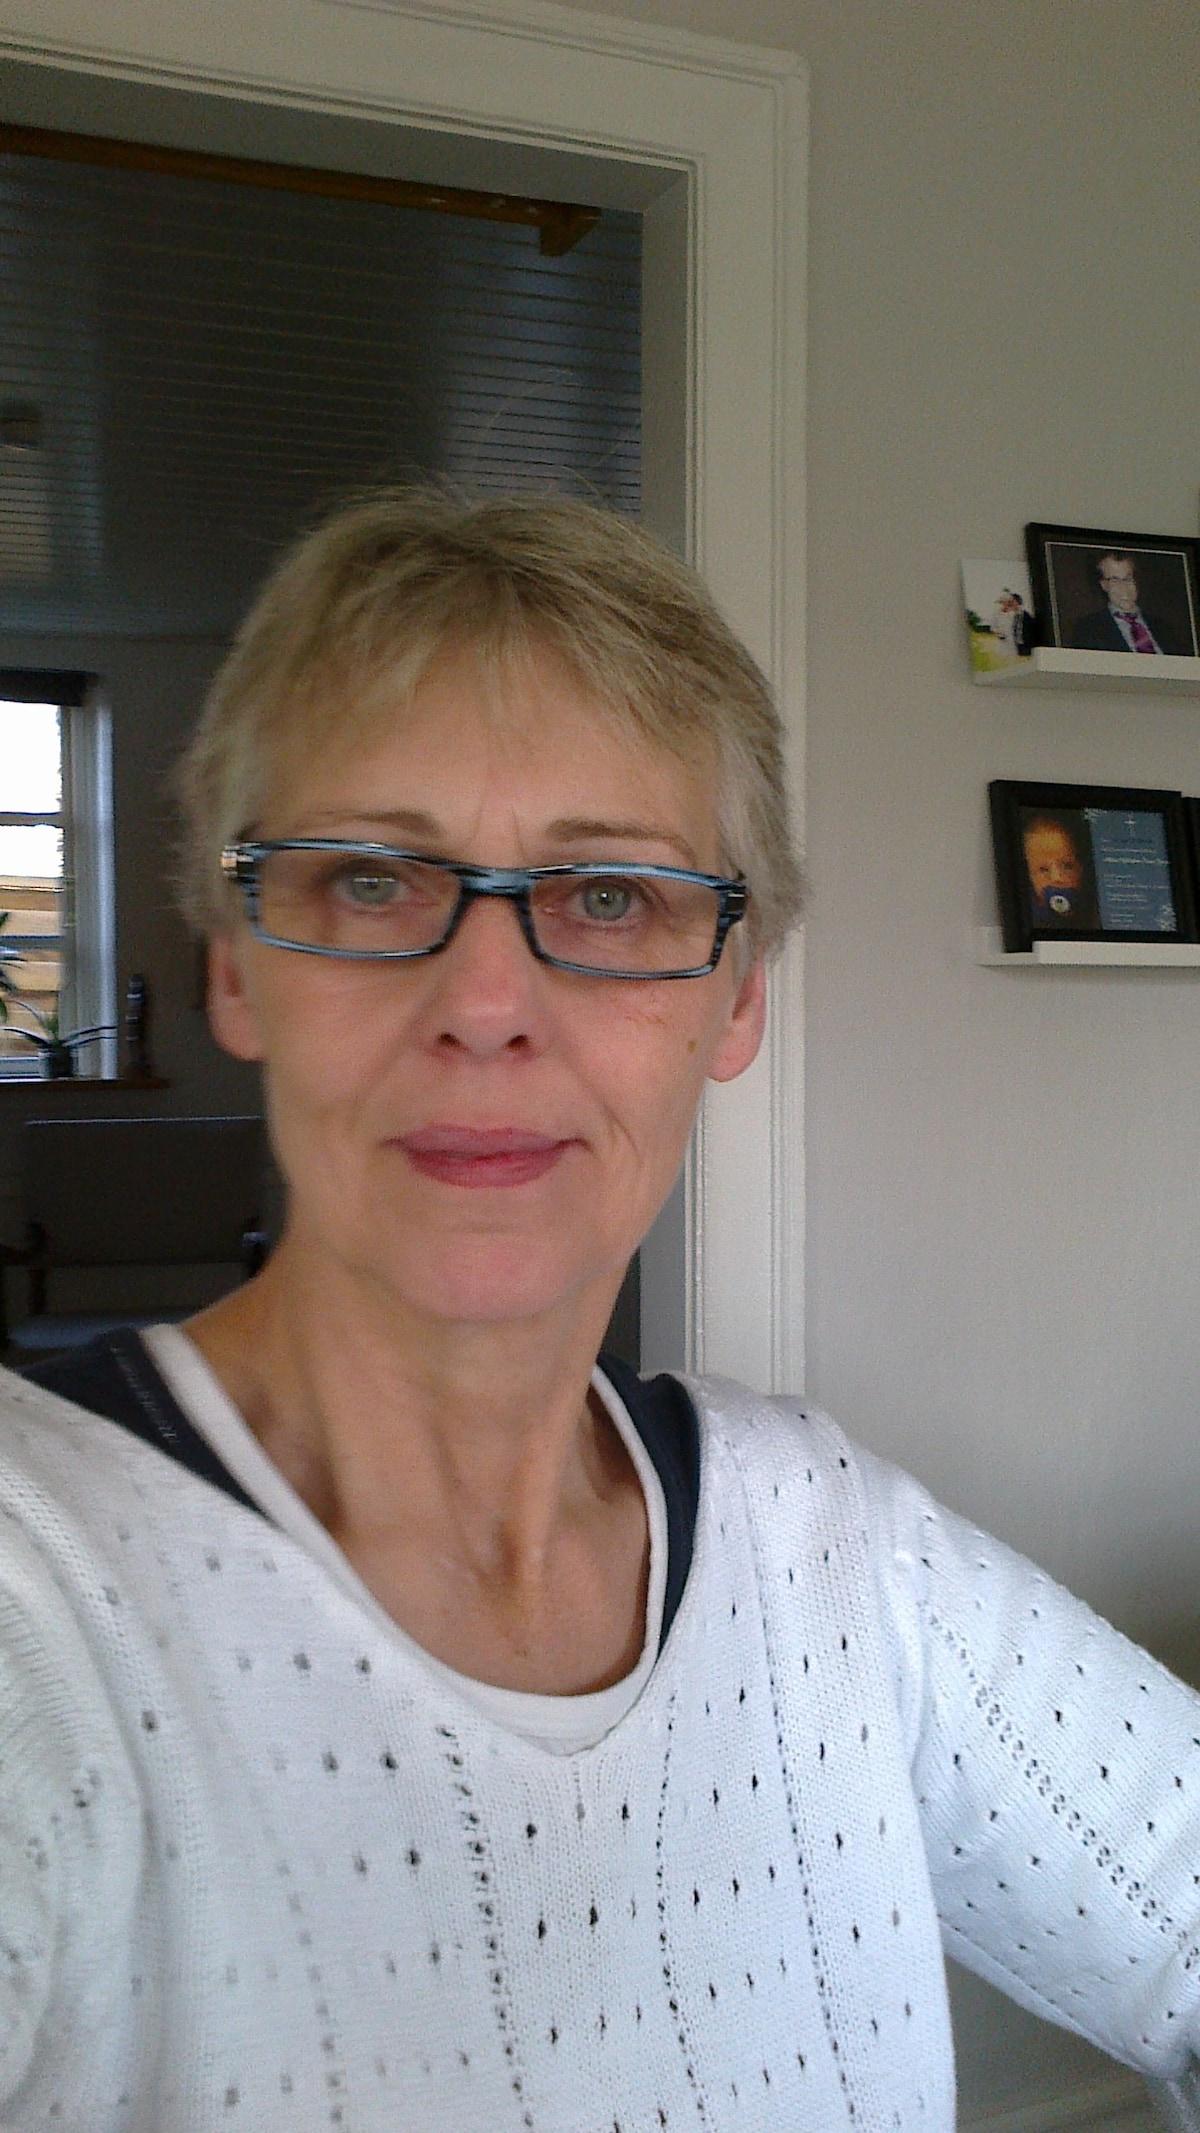 Bente from Nyborg